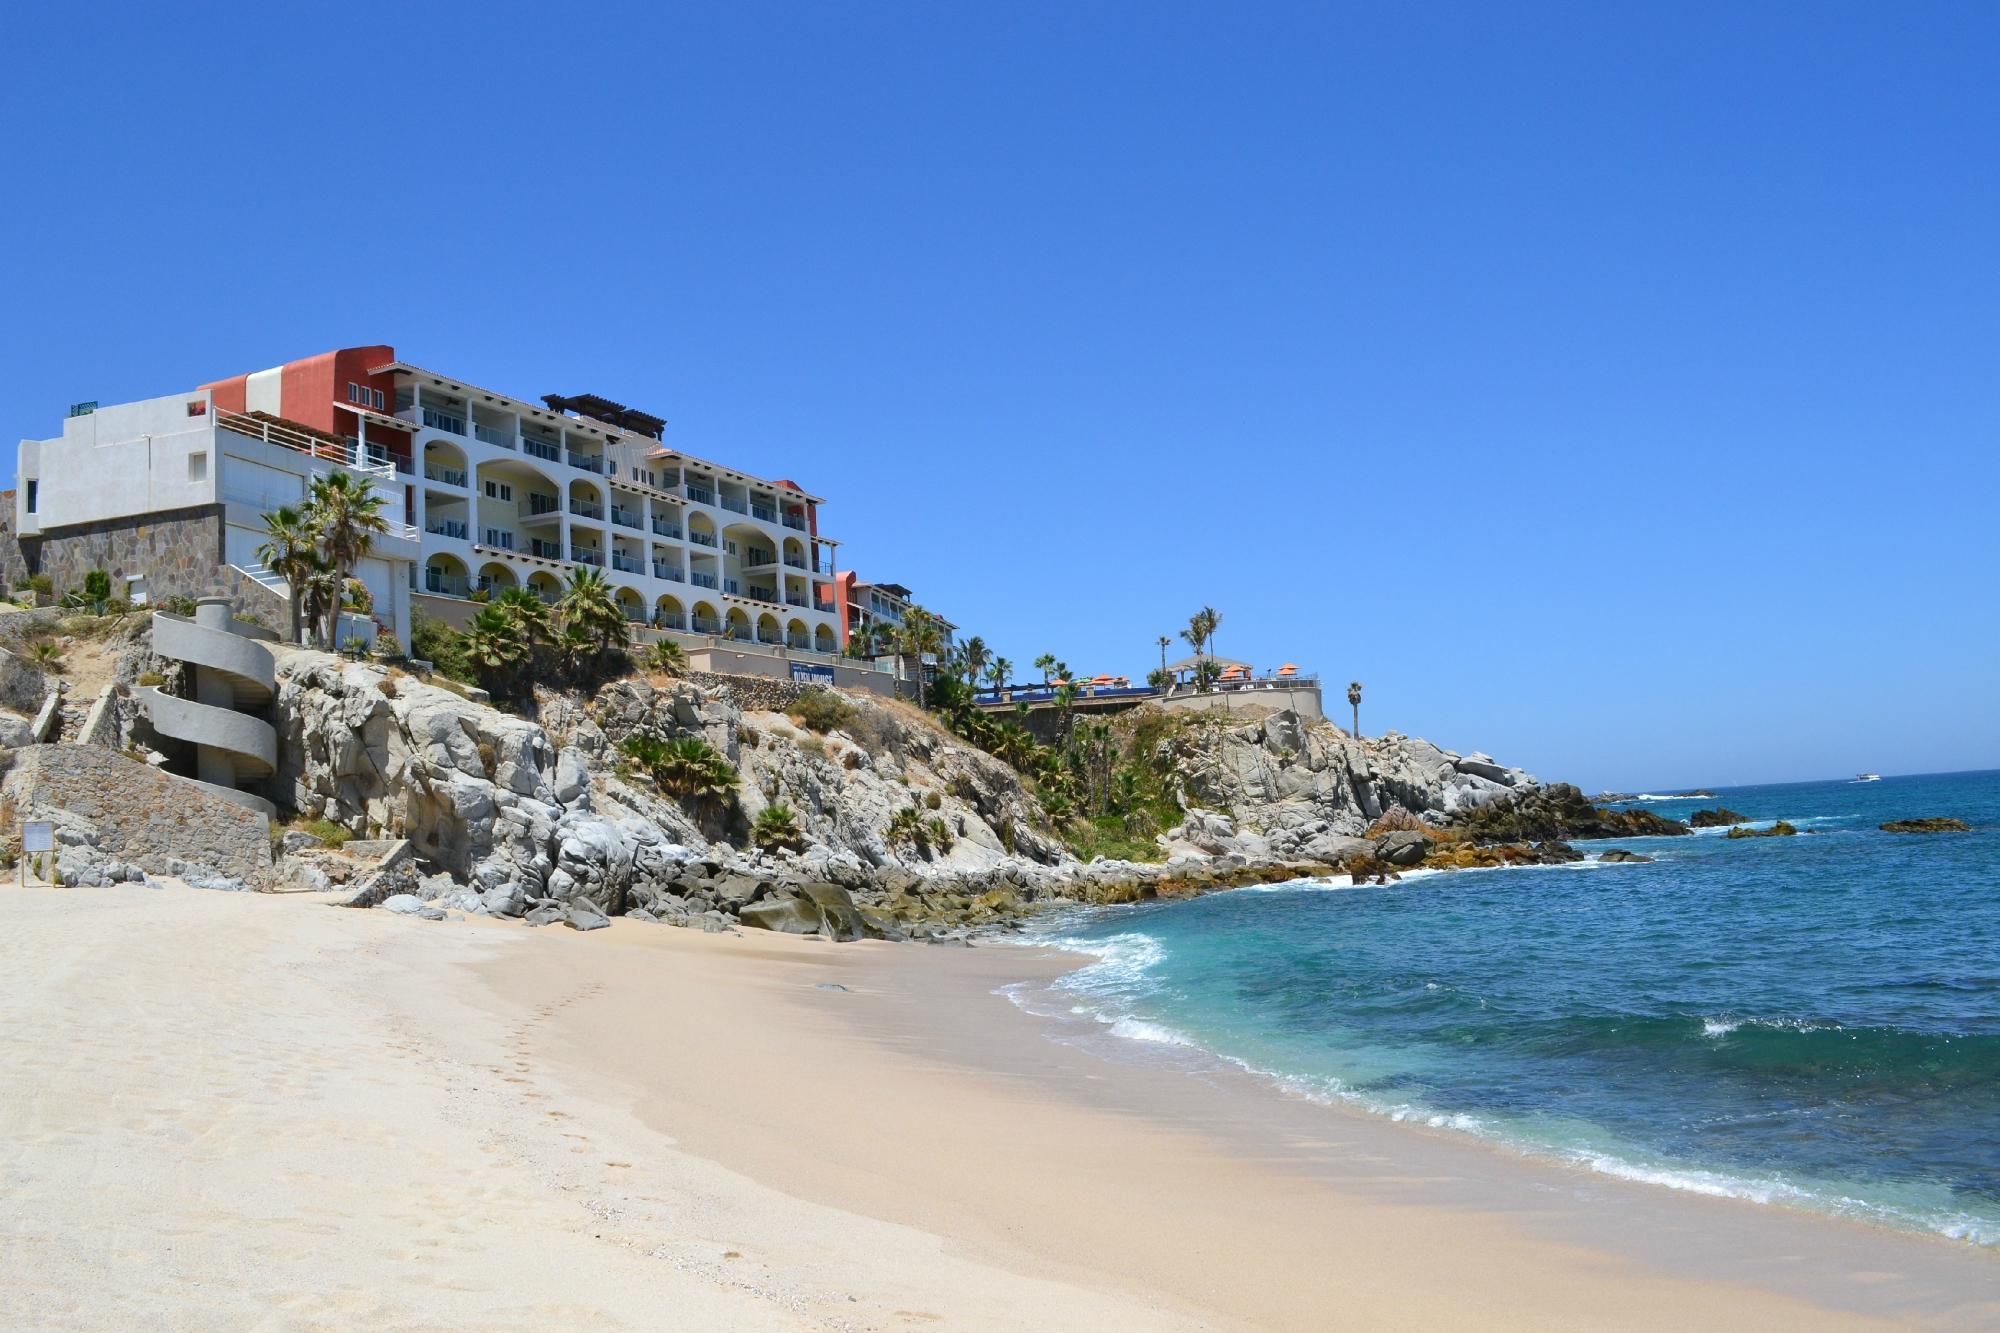 Welk_Resorts_Cabo_San_Lucas_Sirena_del_Mar_Beach_f7ea02143c.jpg